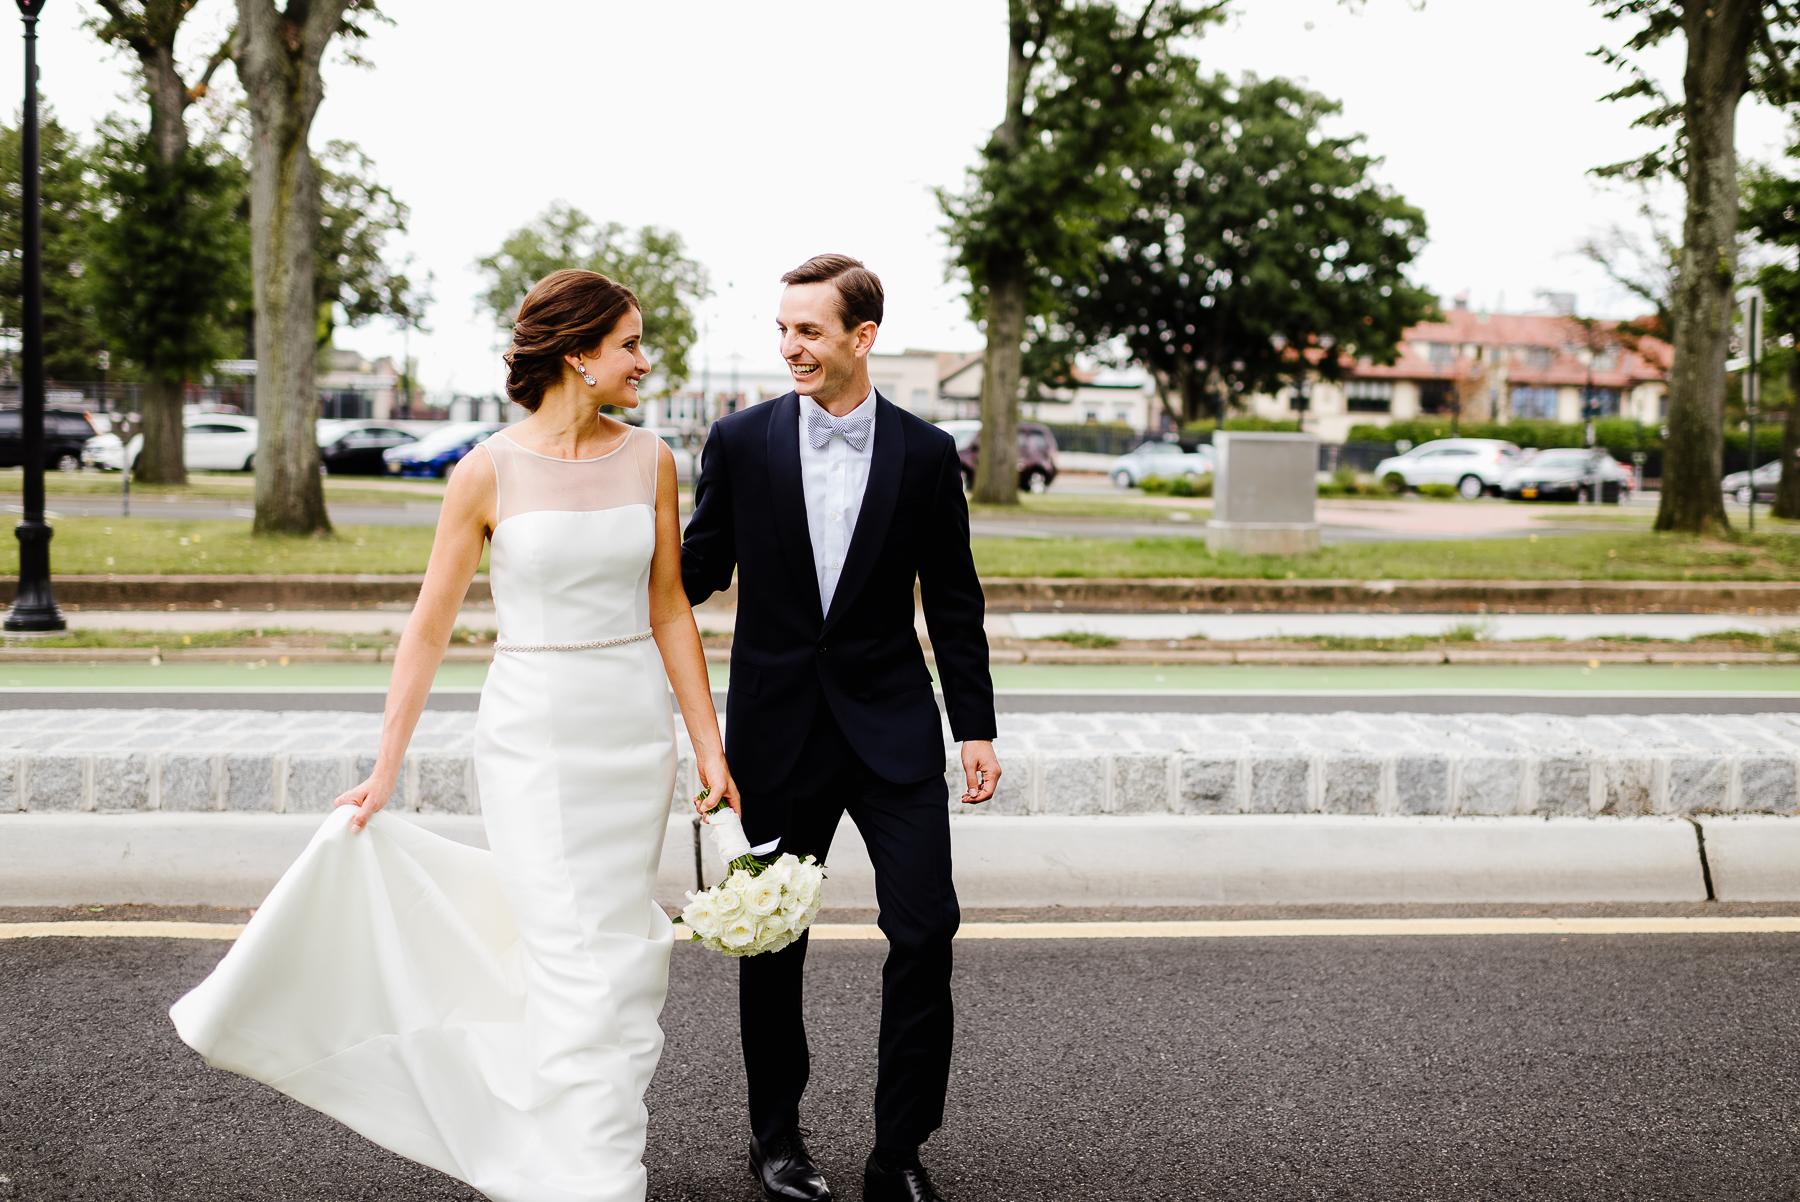 71-J Crew Wedding New Jersey Wedding Photographer J Crew Weddings.jpg